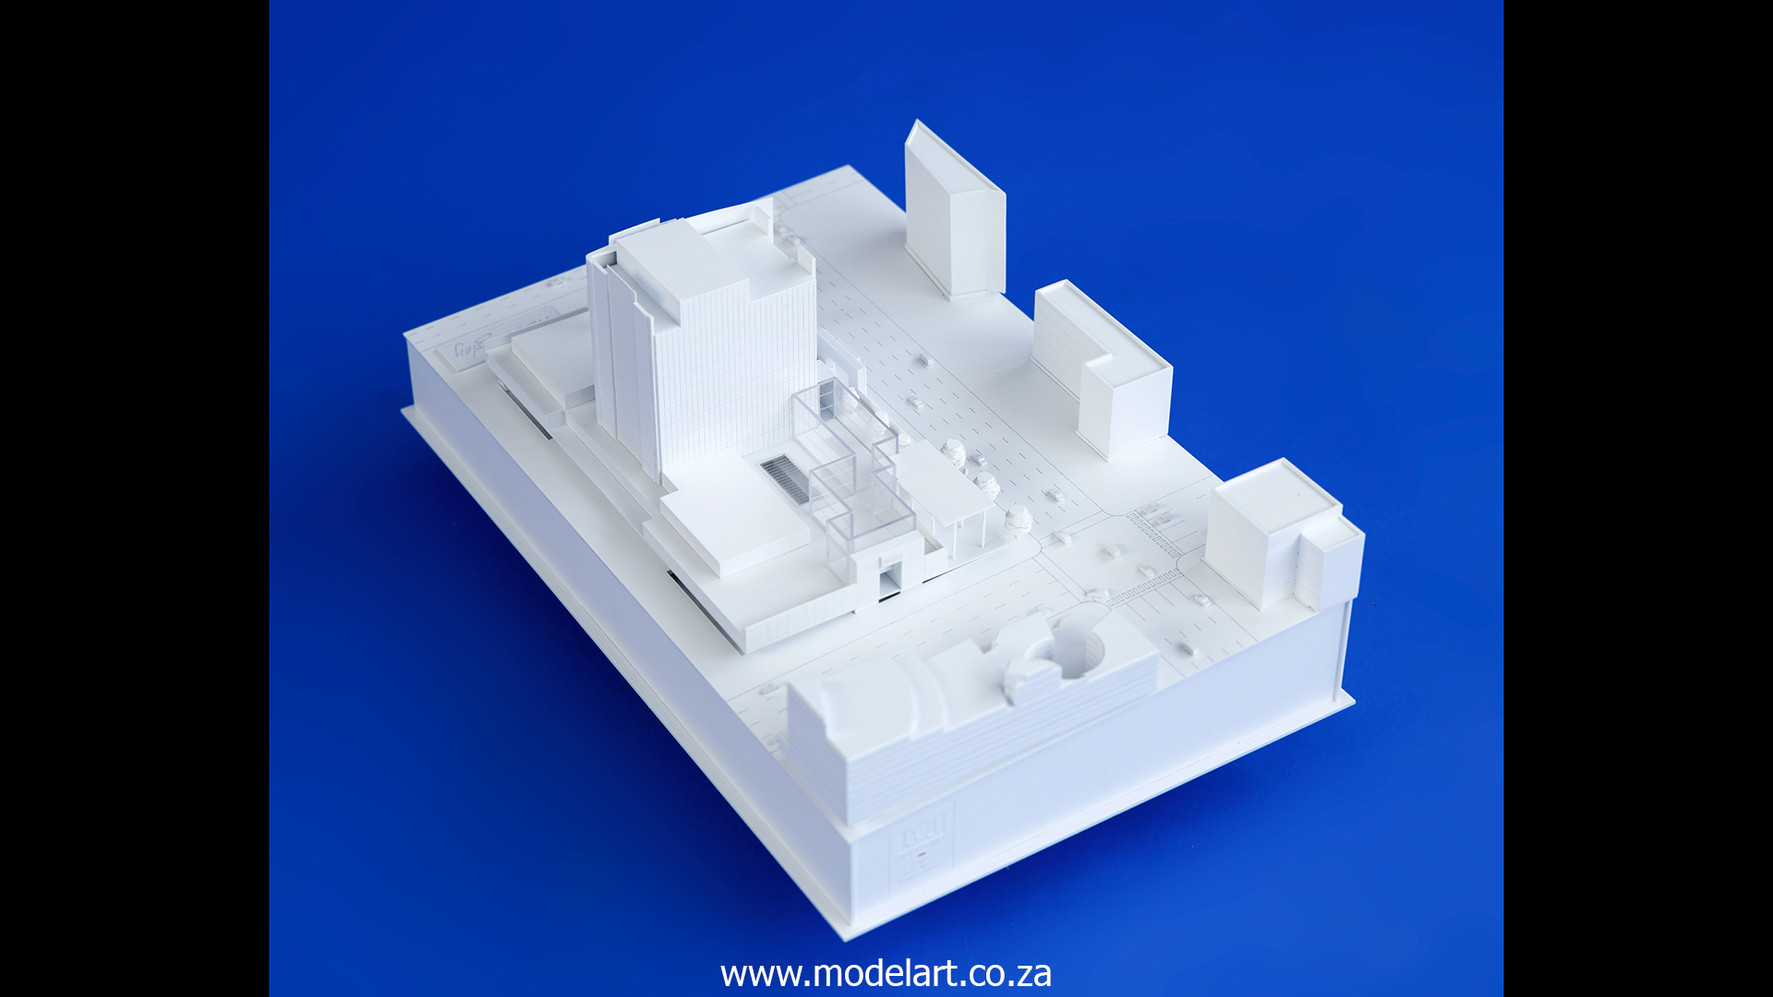 Modelart-ArchitecArchitectural-Scale-Model-Conceptual-Kingsley Centre-3tural-Scale-Model-Conce